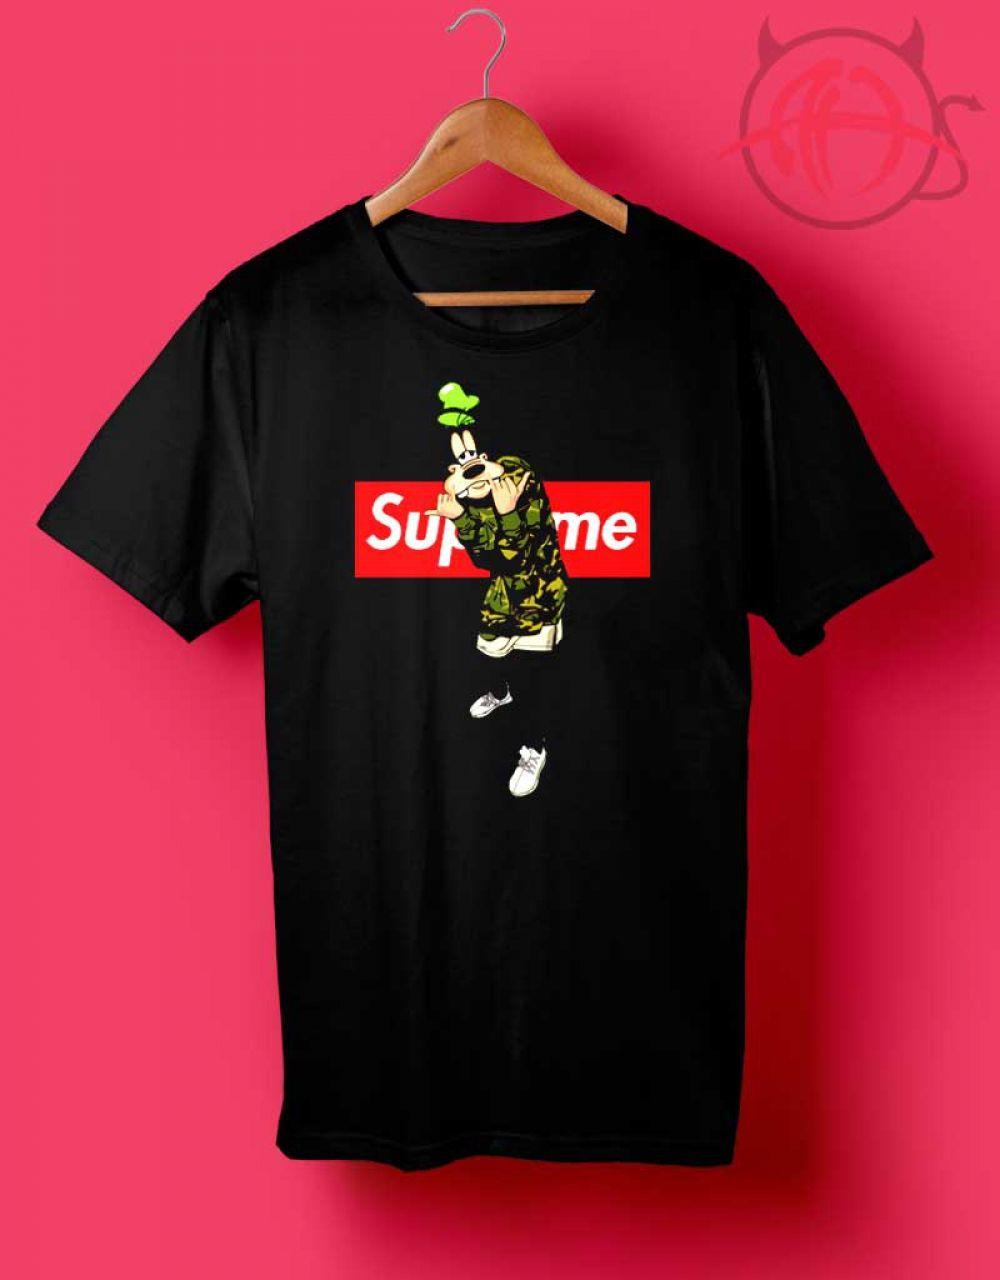 e3f82df85058 Goofy Disney Supreme T Shirt in 2019   Clothing   Supreme t shirt ...